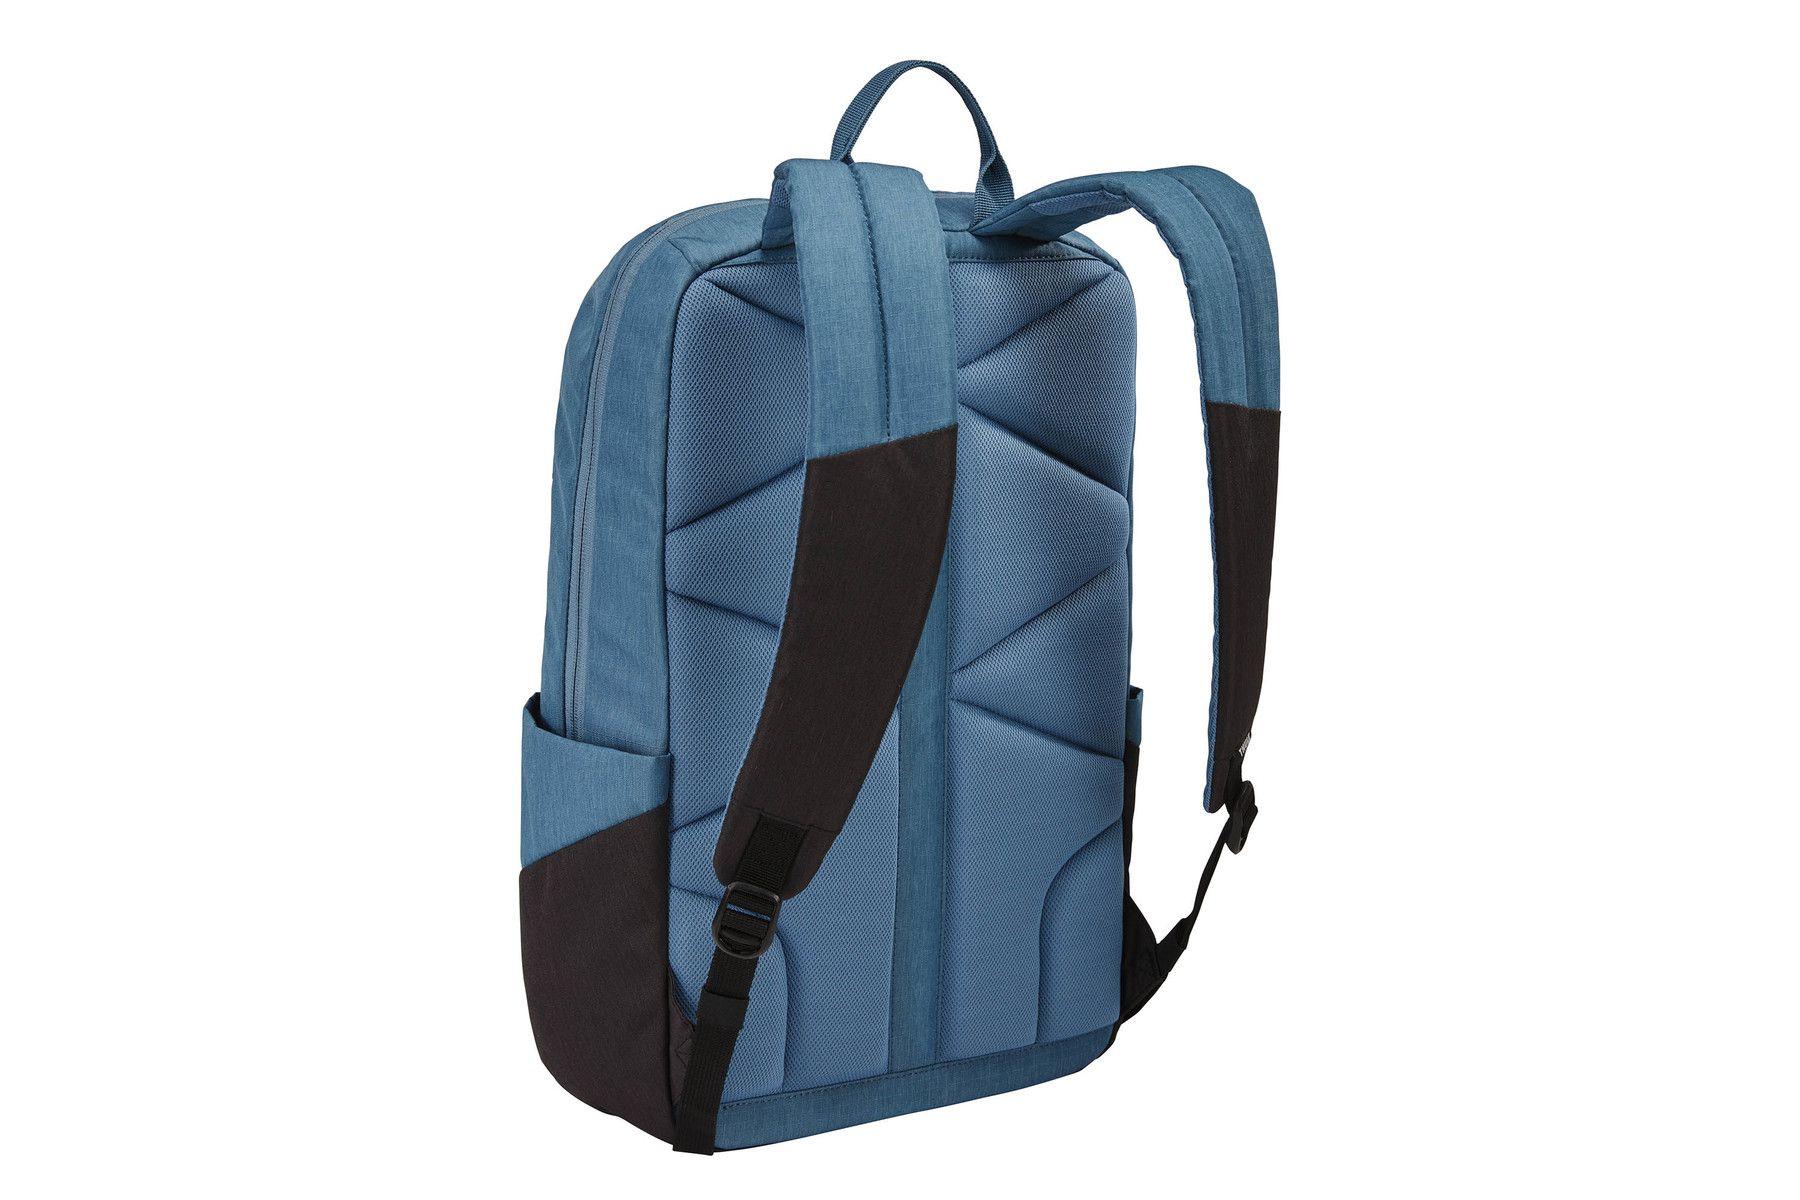 MOCHILA LITHOS  BACK PACK 20L - BLUE/BLACK - THULE